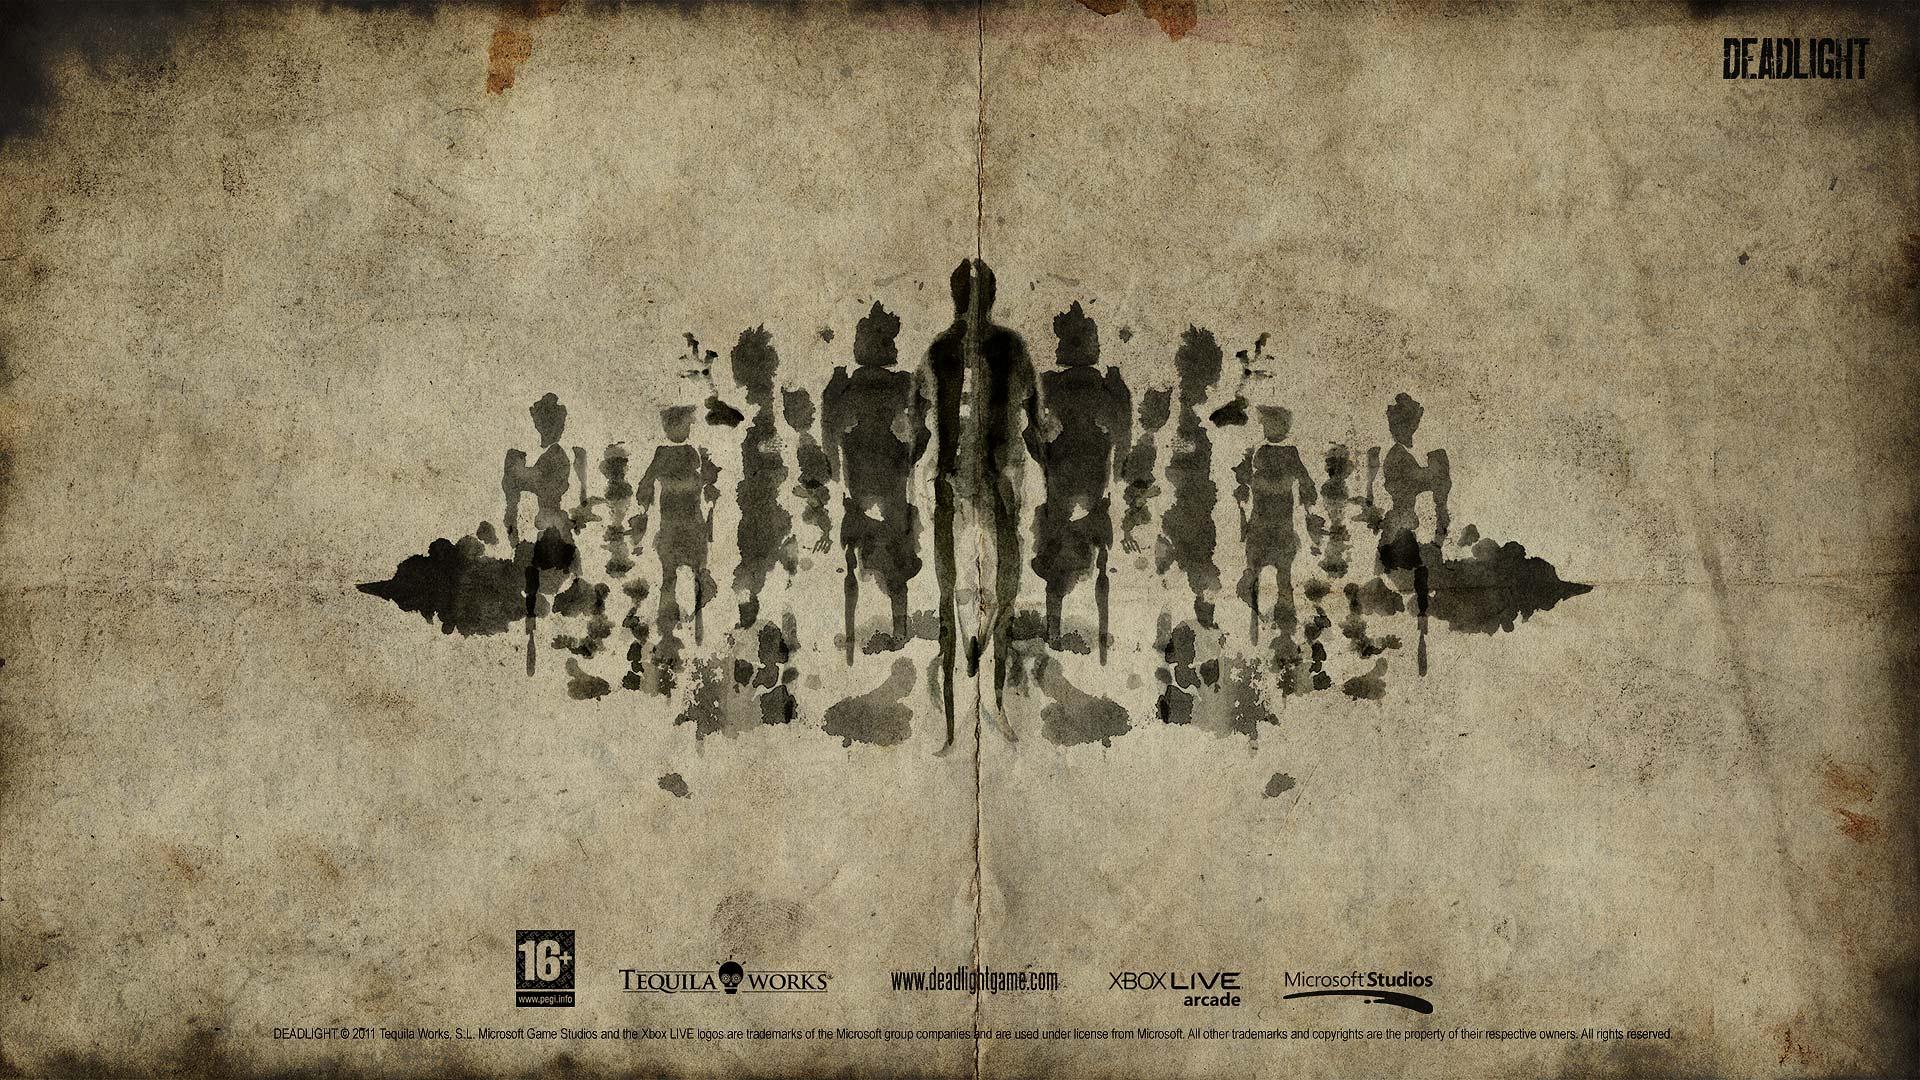 Deadlight HD Wallpaper | Background